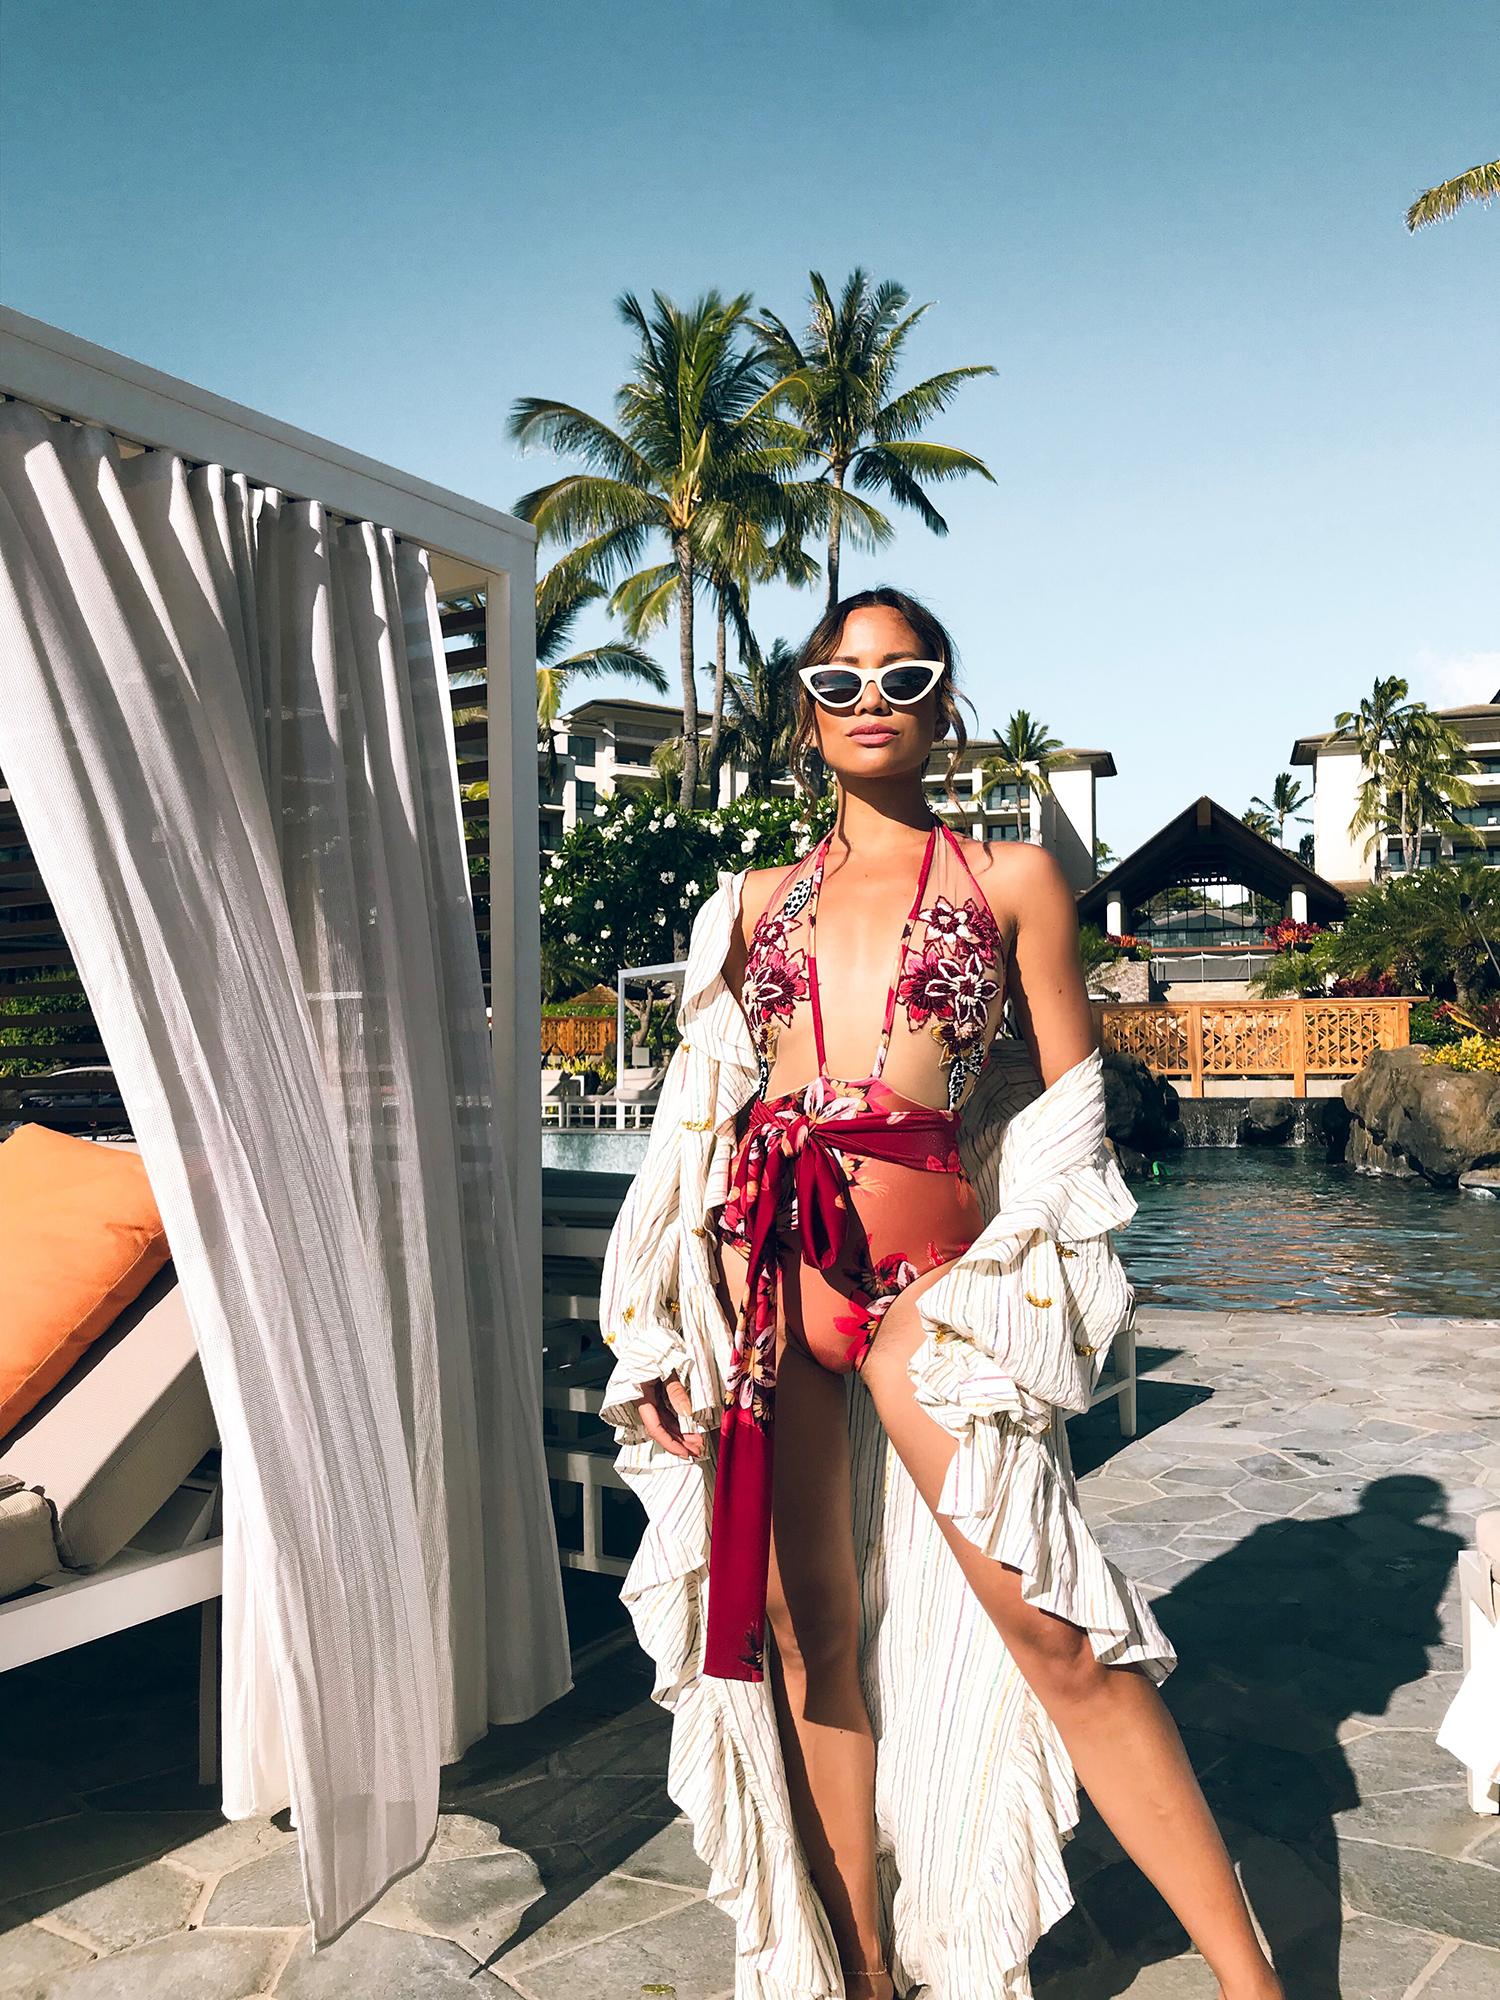 Jessi Malay wearing PatBo One-Piece Swimsuit